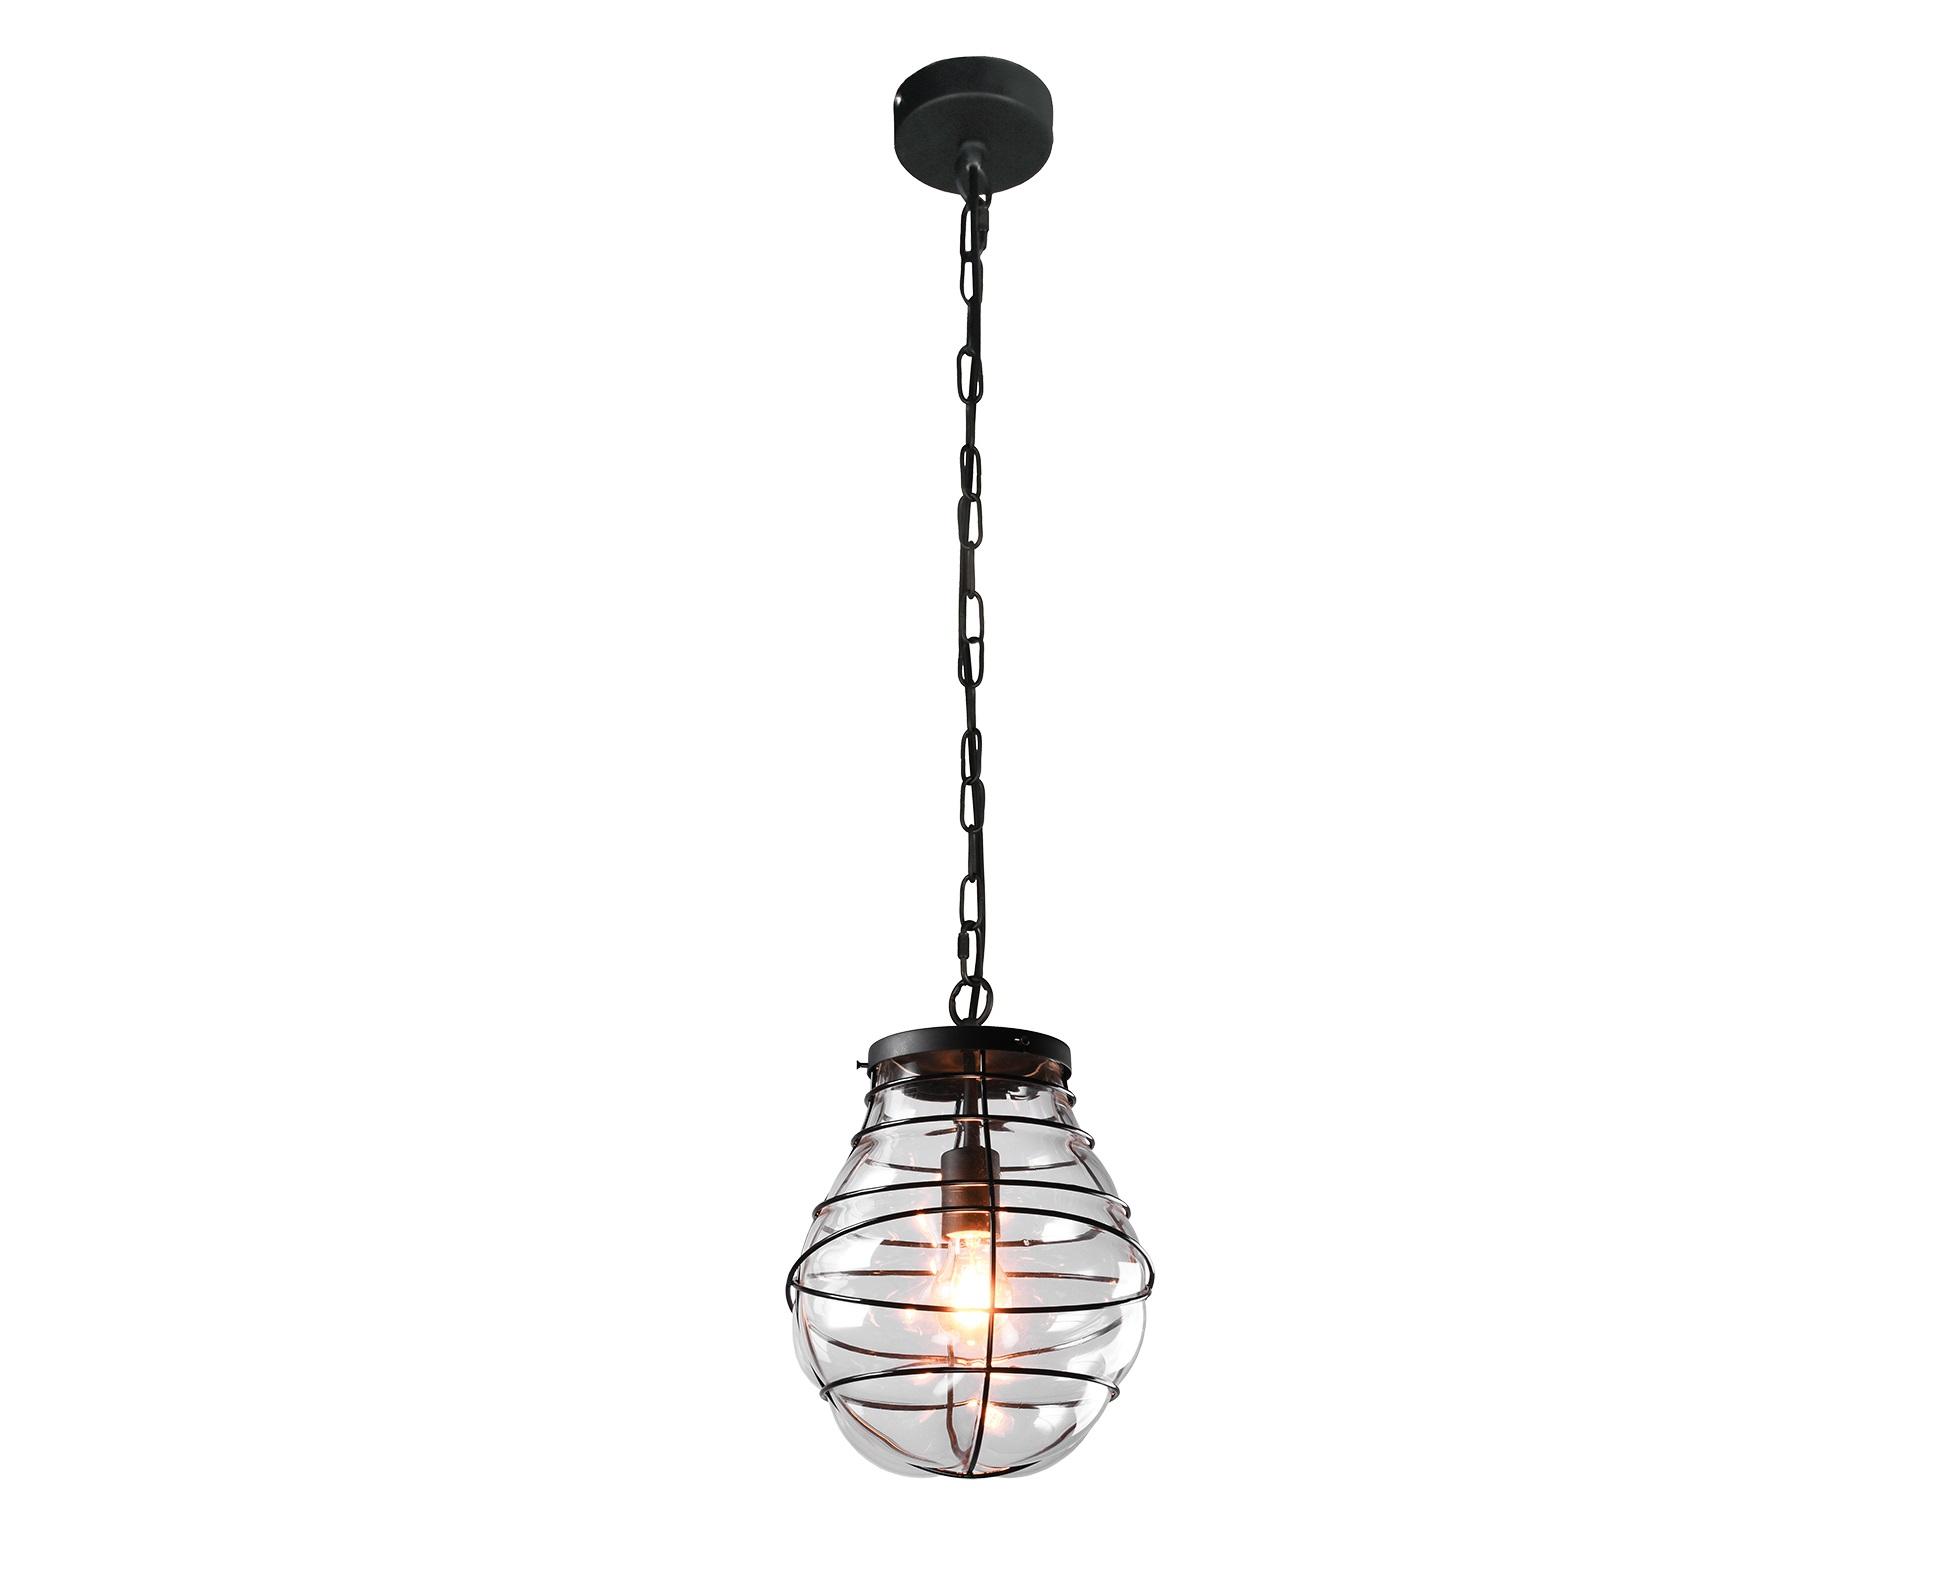 Подвесной светильникПодвесные светильники<br>&amp;lt;div&amp;gt;&amp;lt;div&amp;gt;Вид цоколя: E27&amp;lt;/div&amp;gt;&amp;lt;div&amp;gt;Мощность: 60W&amp;lt;/div&amp;gt;&amp;lt;div&amp;gt;Количество ламп: 1&amp;lt;/div&amp;gt;&amp;lt;div&amp;gt;Наличие ламп: отсутствуют.&amp;lt;/div&amp;gt;&amp;lt;/div&amp;gt;<br><br>Material: Металл<br>Width см: None<br>Height см: 120<br>Diameter см: 26